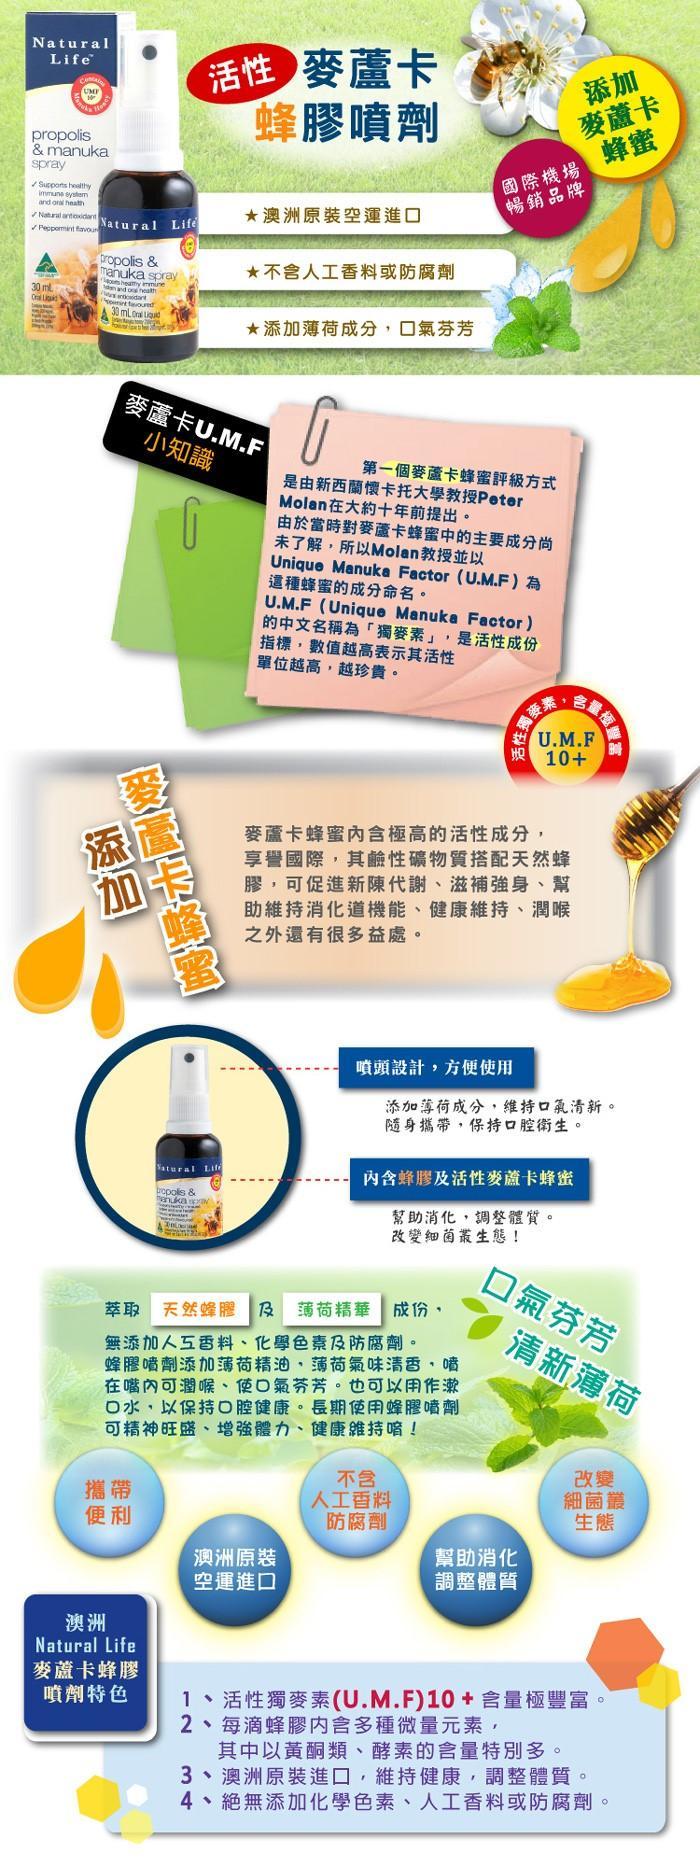 Natural Life-澳洲活性麥蘆卡蜂膠噴劑(30ml)產品資訊